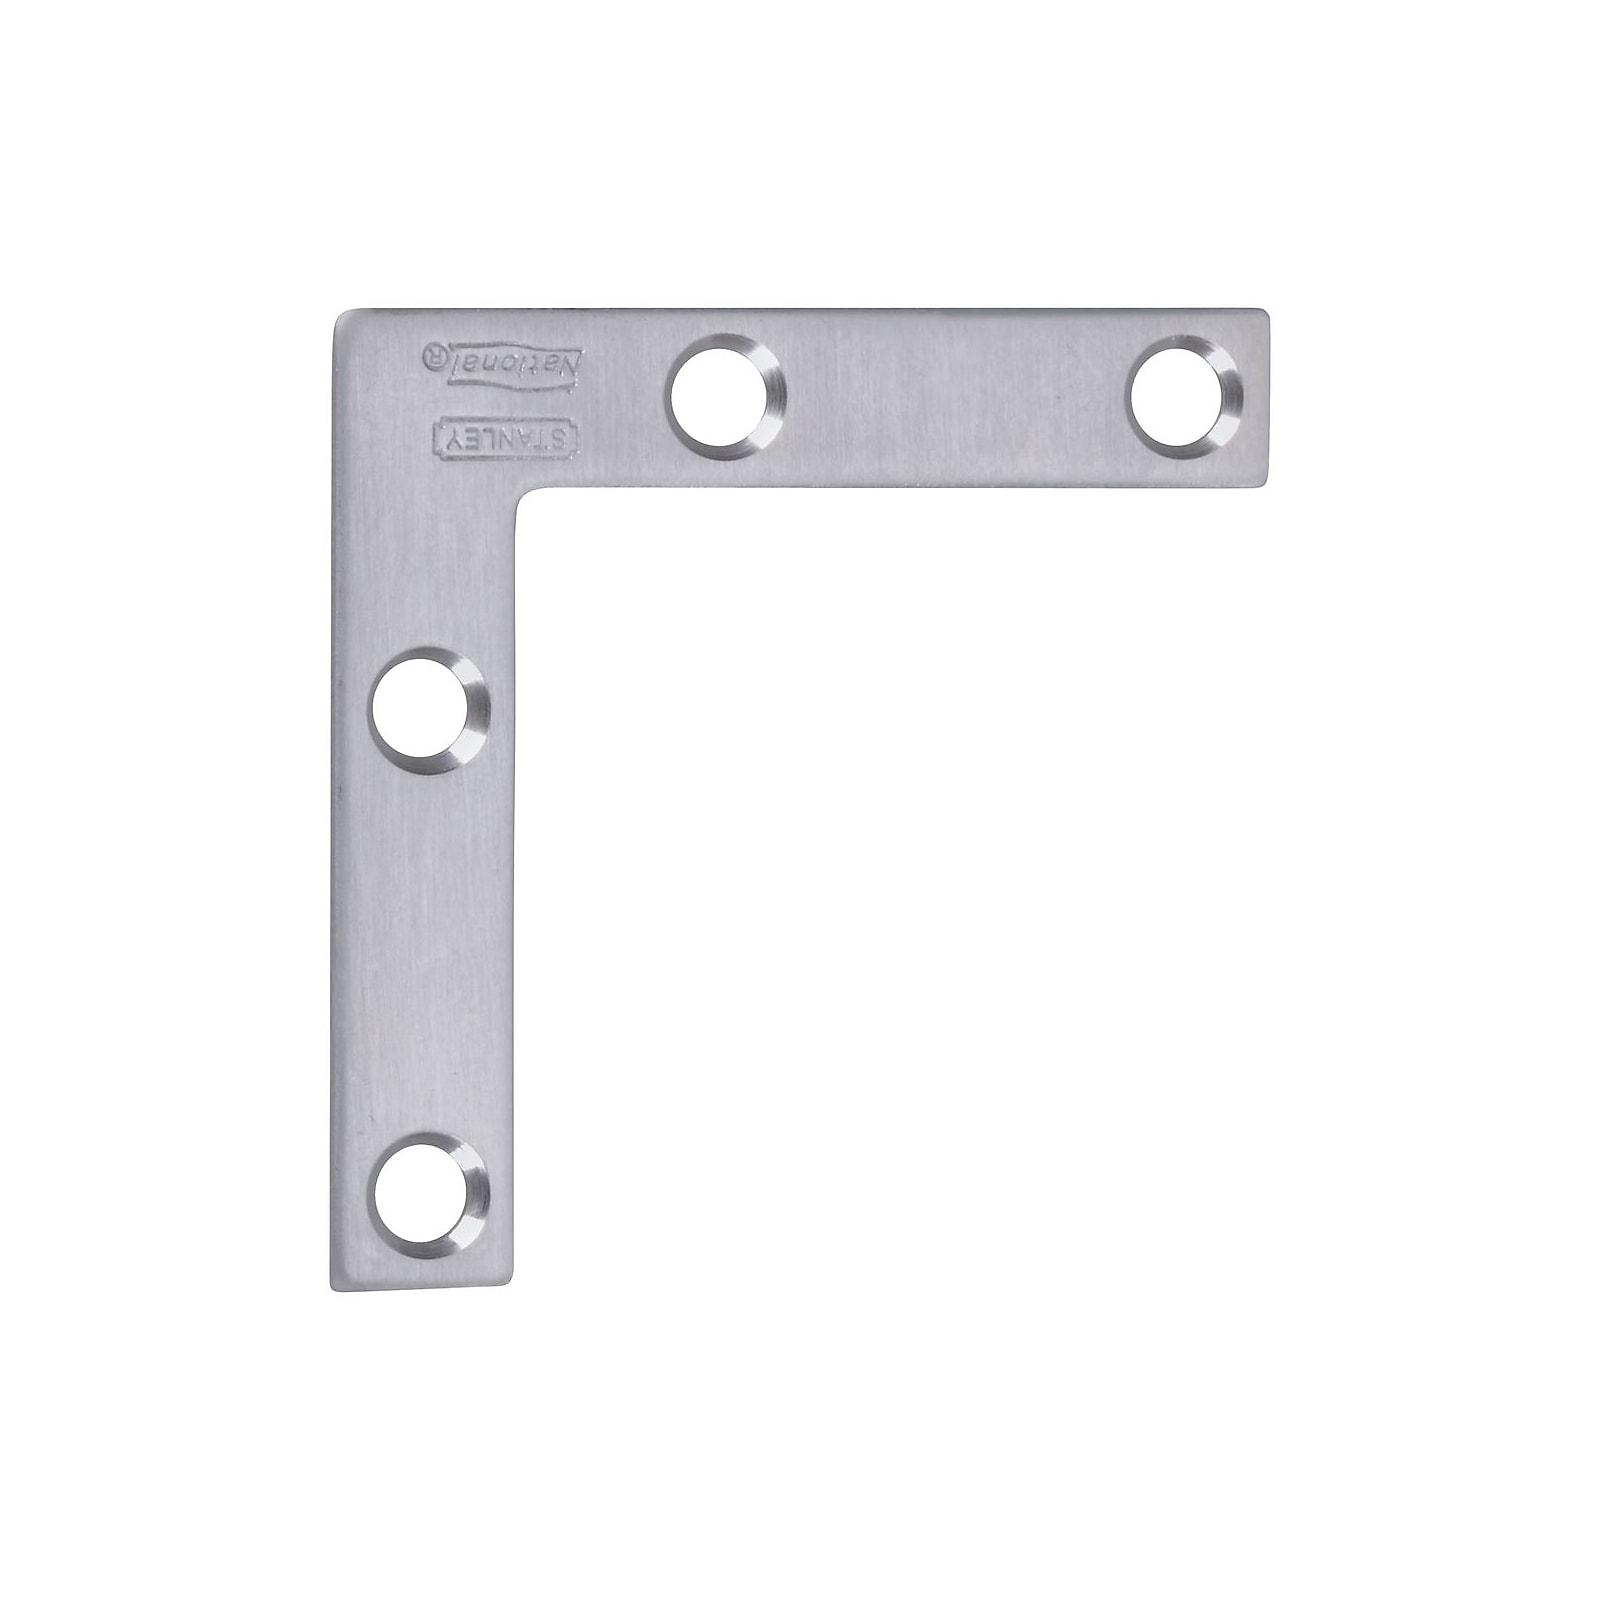 Stanley 348-326 Flat Corner Brace, 2 x 3/8, Stainless Steel